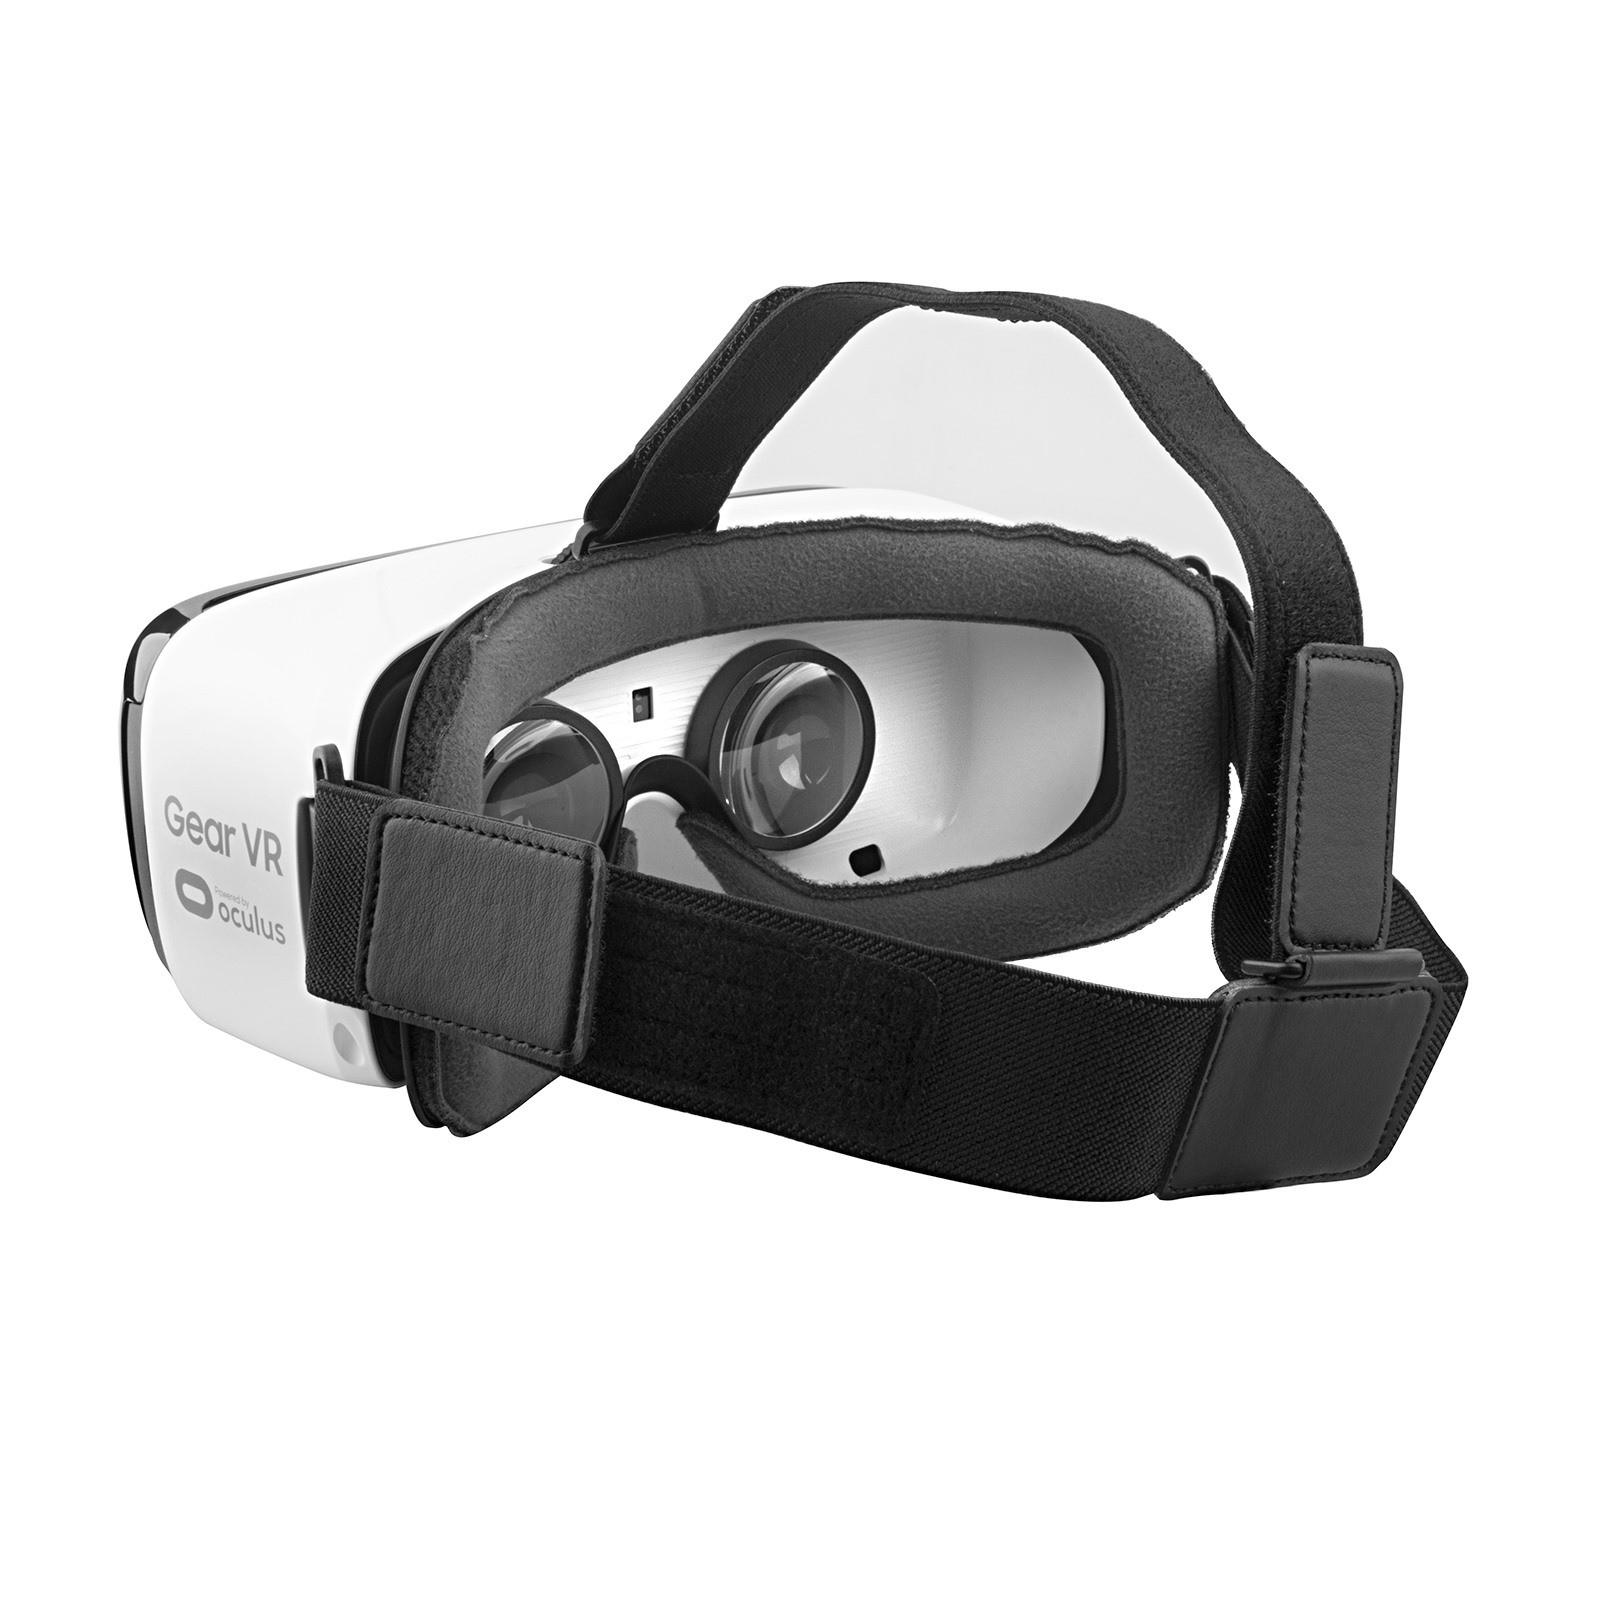 Samsung Gear VR Vitual Reality Headset-R322 (New Bulk) $12.99 + Free Shipping